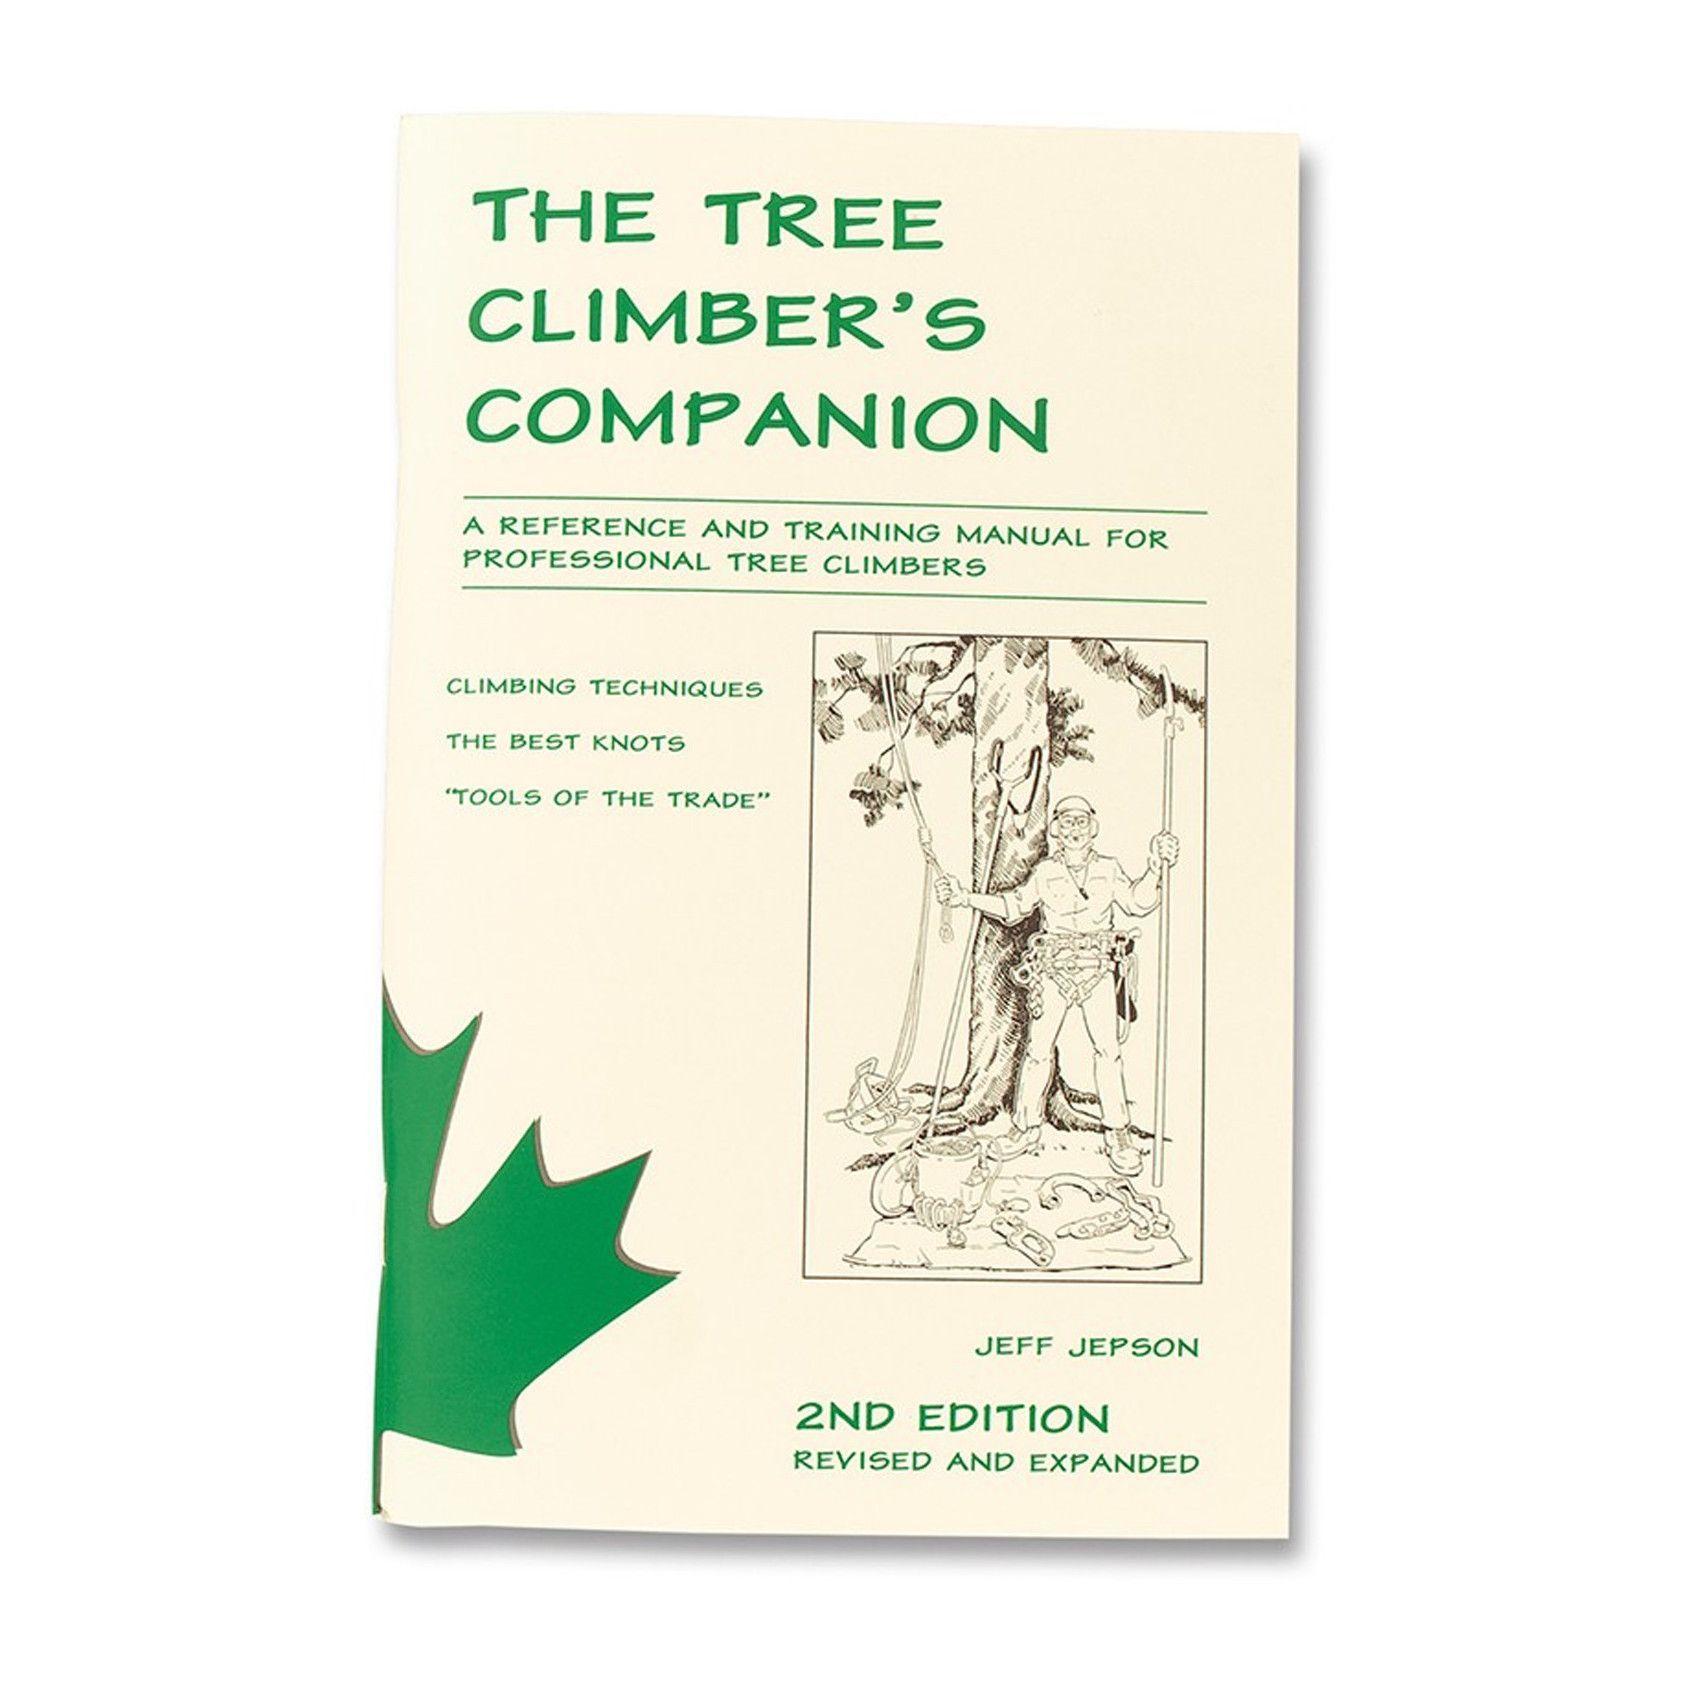 Beaver Tree Service Arborist Book The Tree Climber S Companion 45 802 J L Matthews Co Inc Arborist Tree Service Books